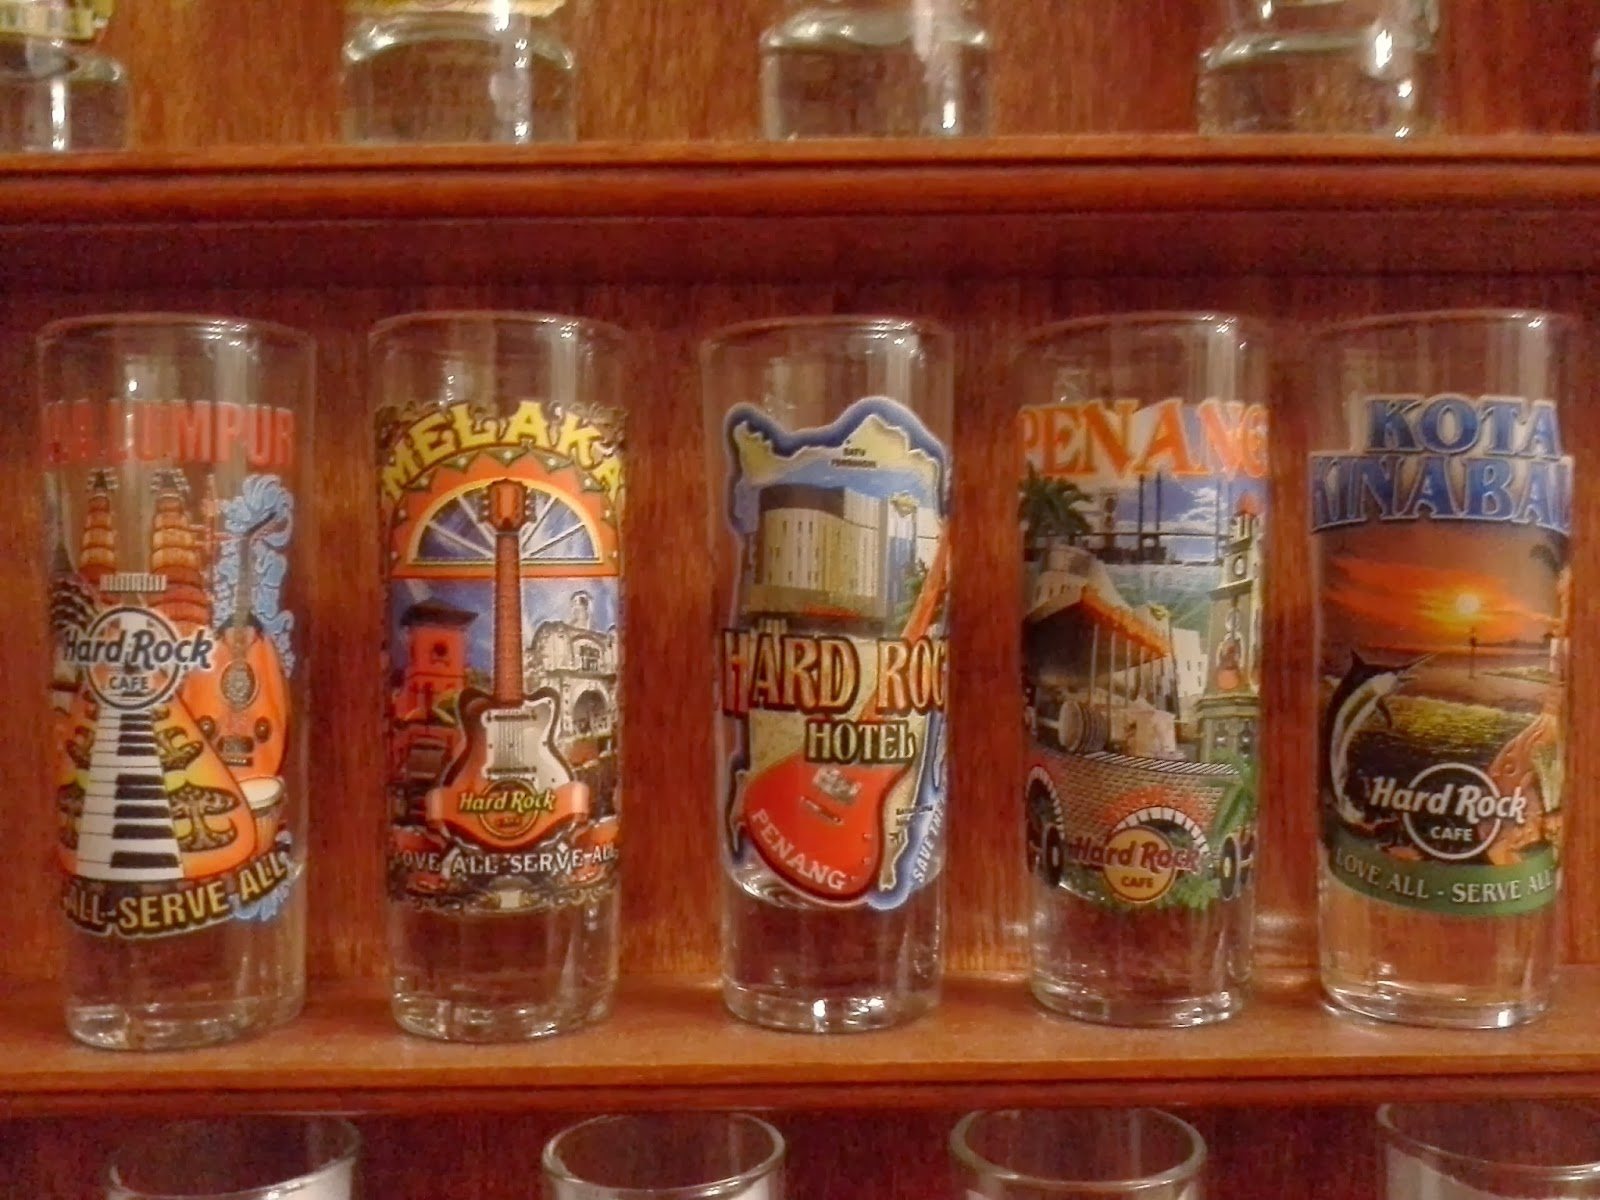 Hard Rock Cafe Shot Glass Collection